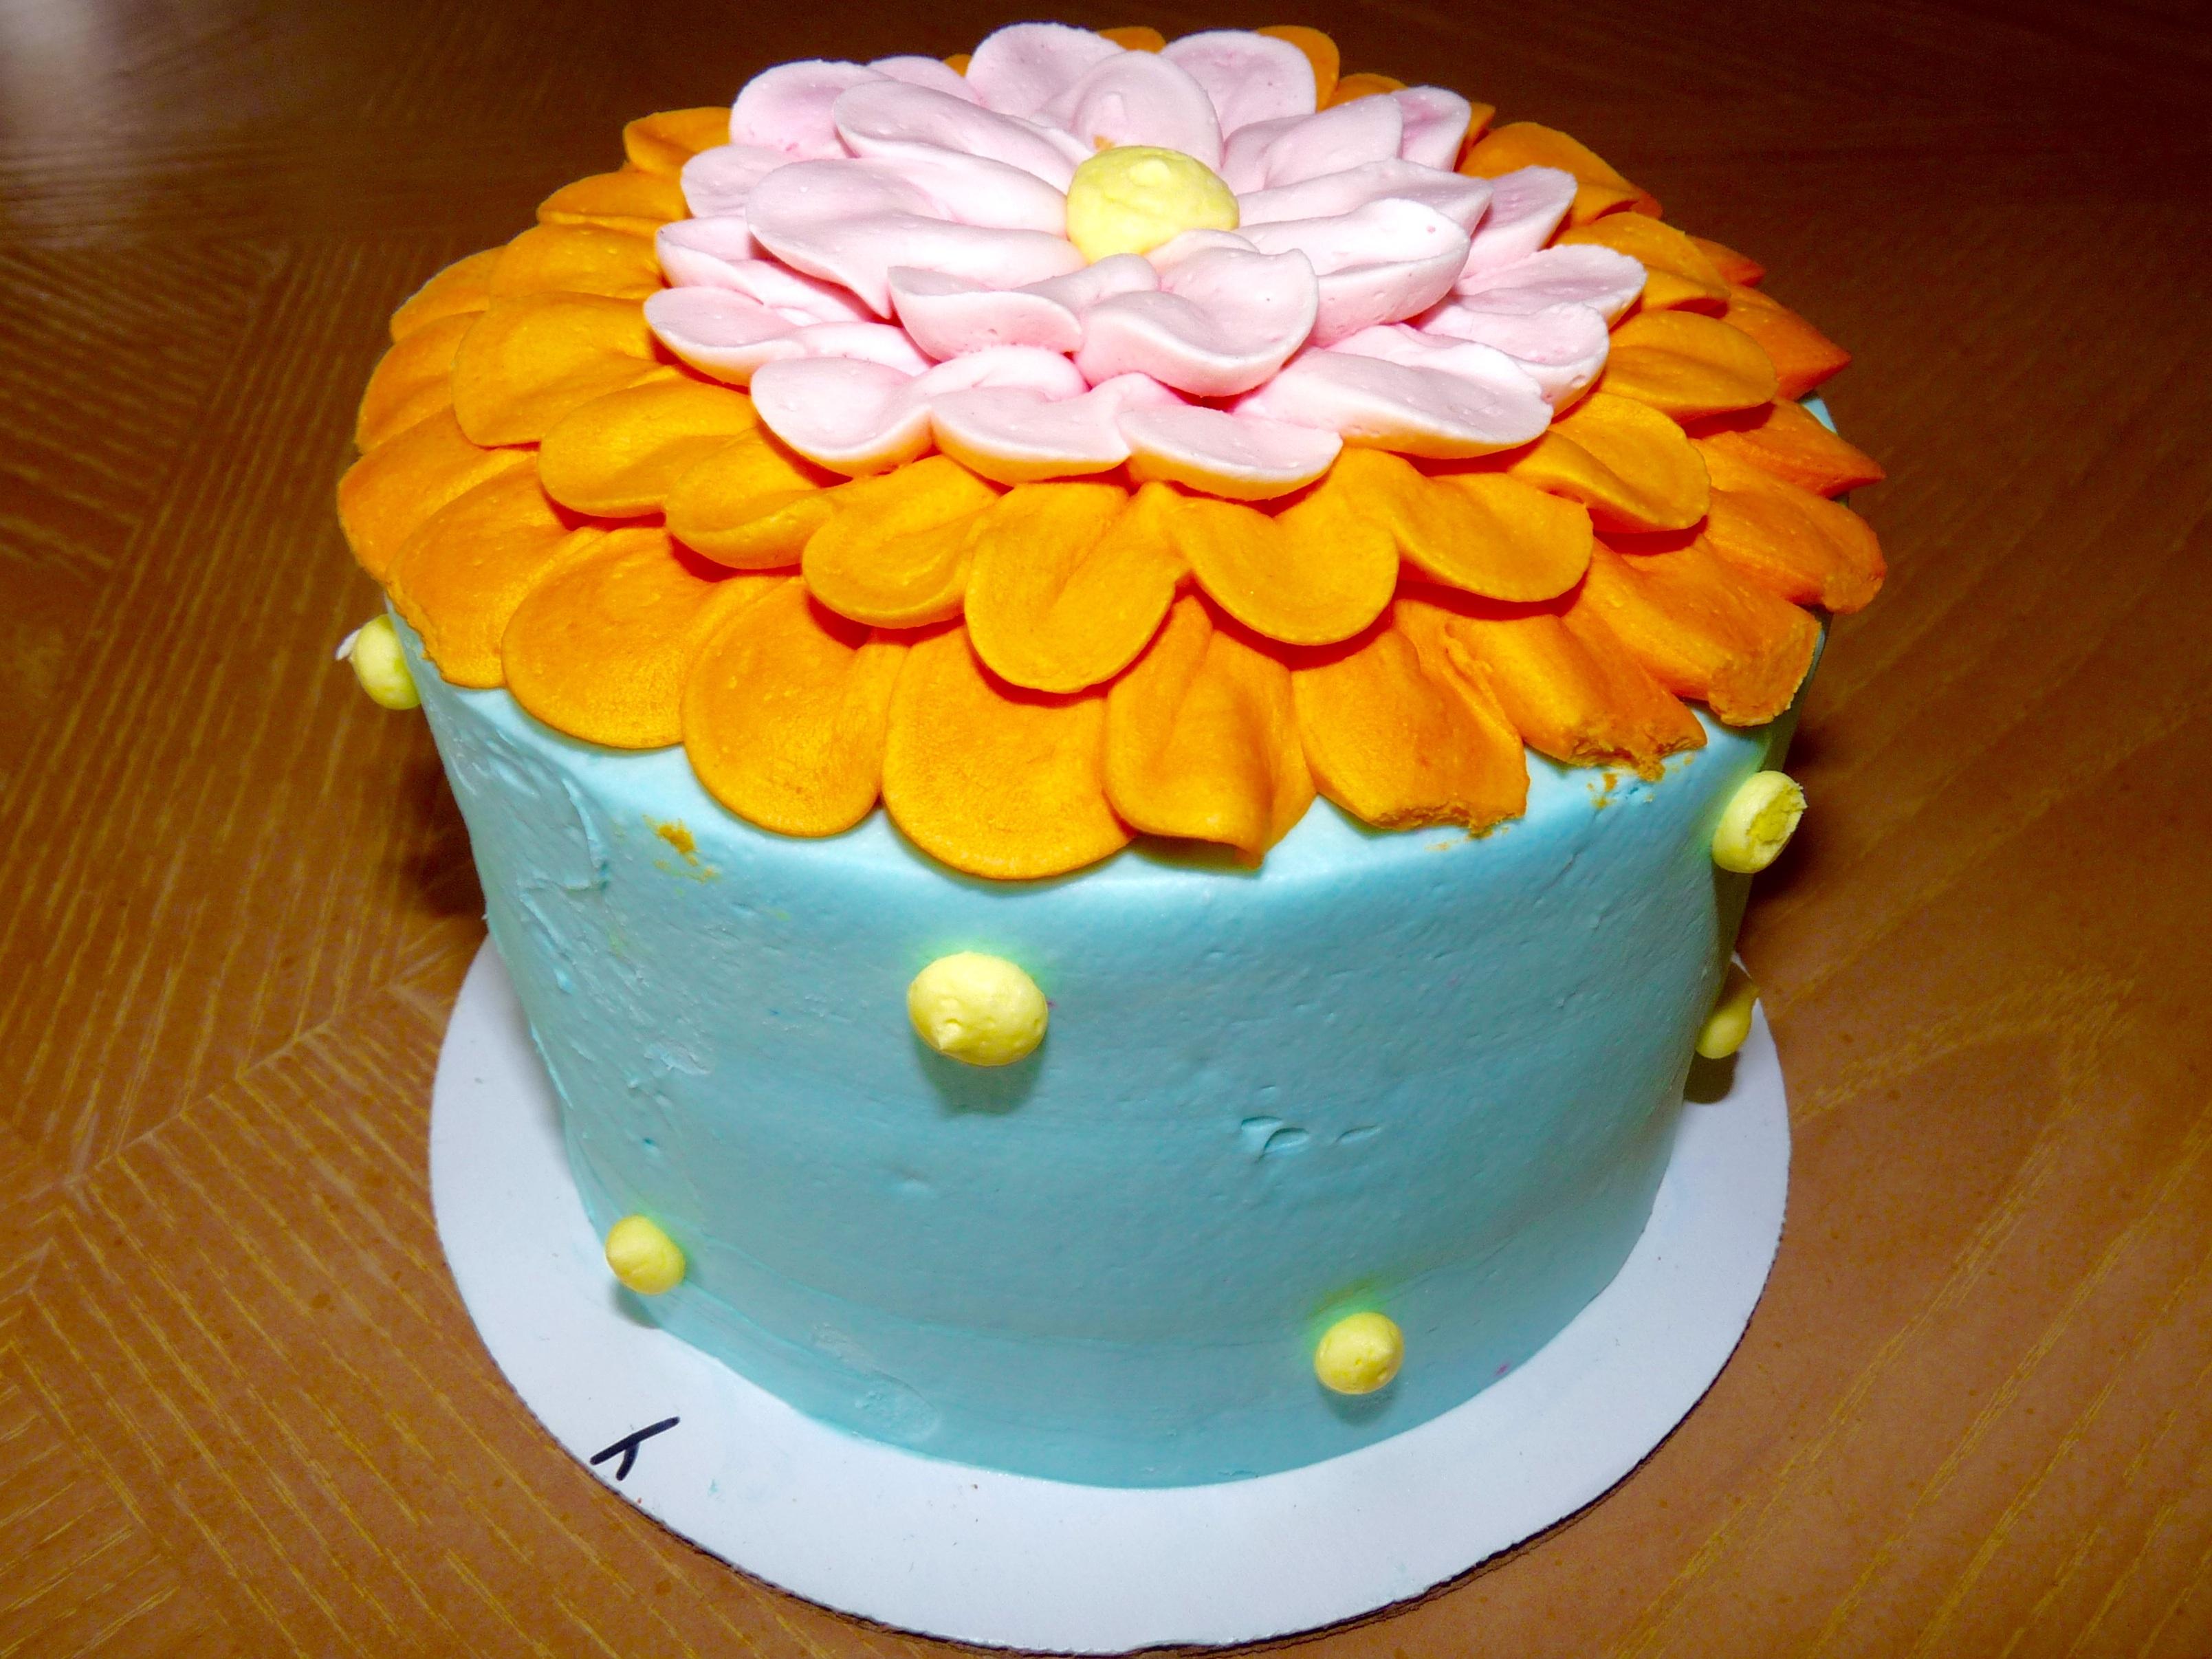 Free Images Sweet Flower Decoration Orange Food Yellow